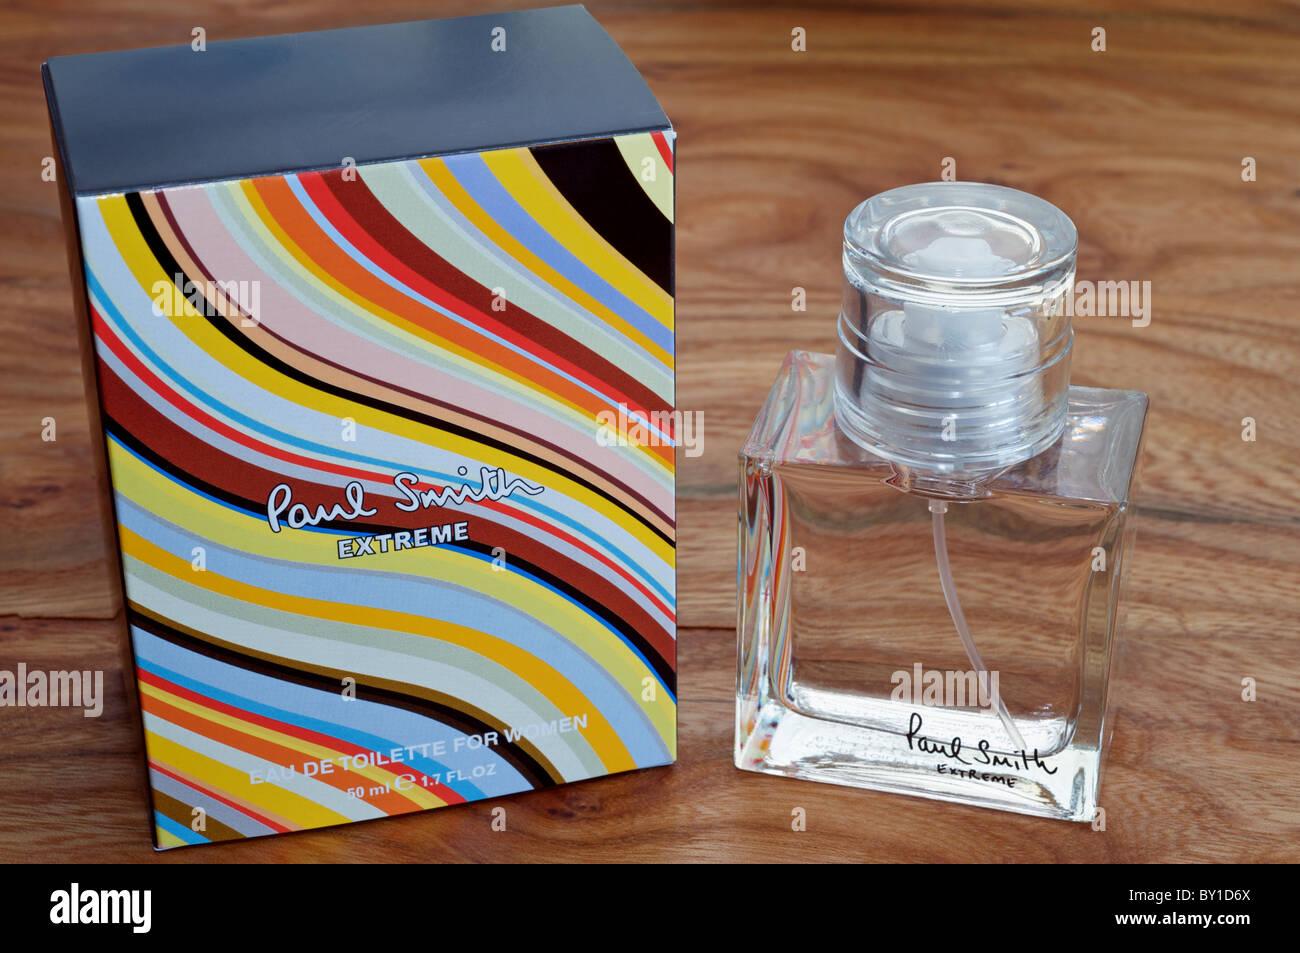 Paul Smith Extreme ladies perfume Stock Photo